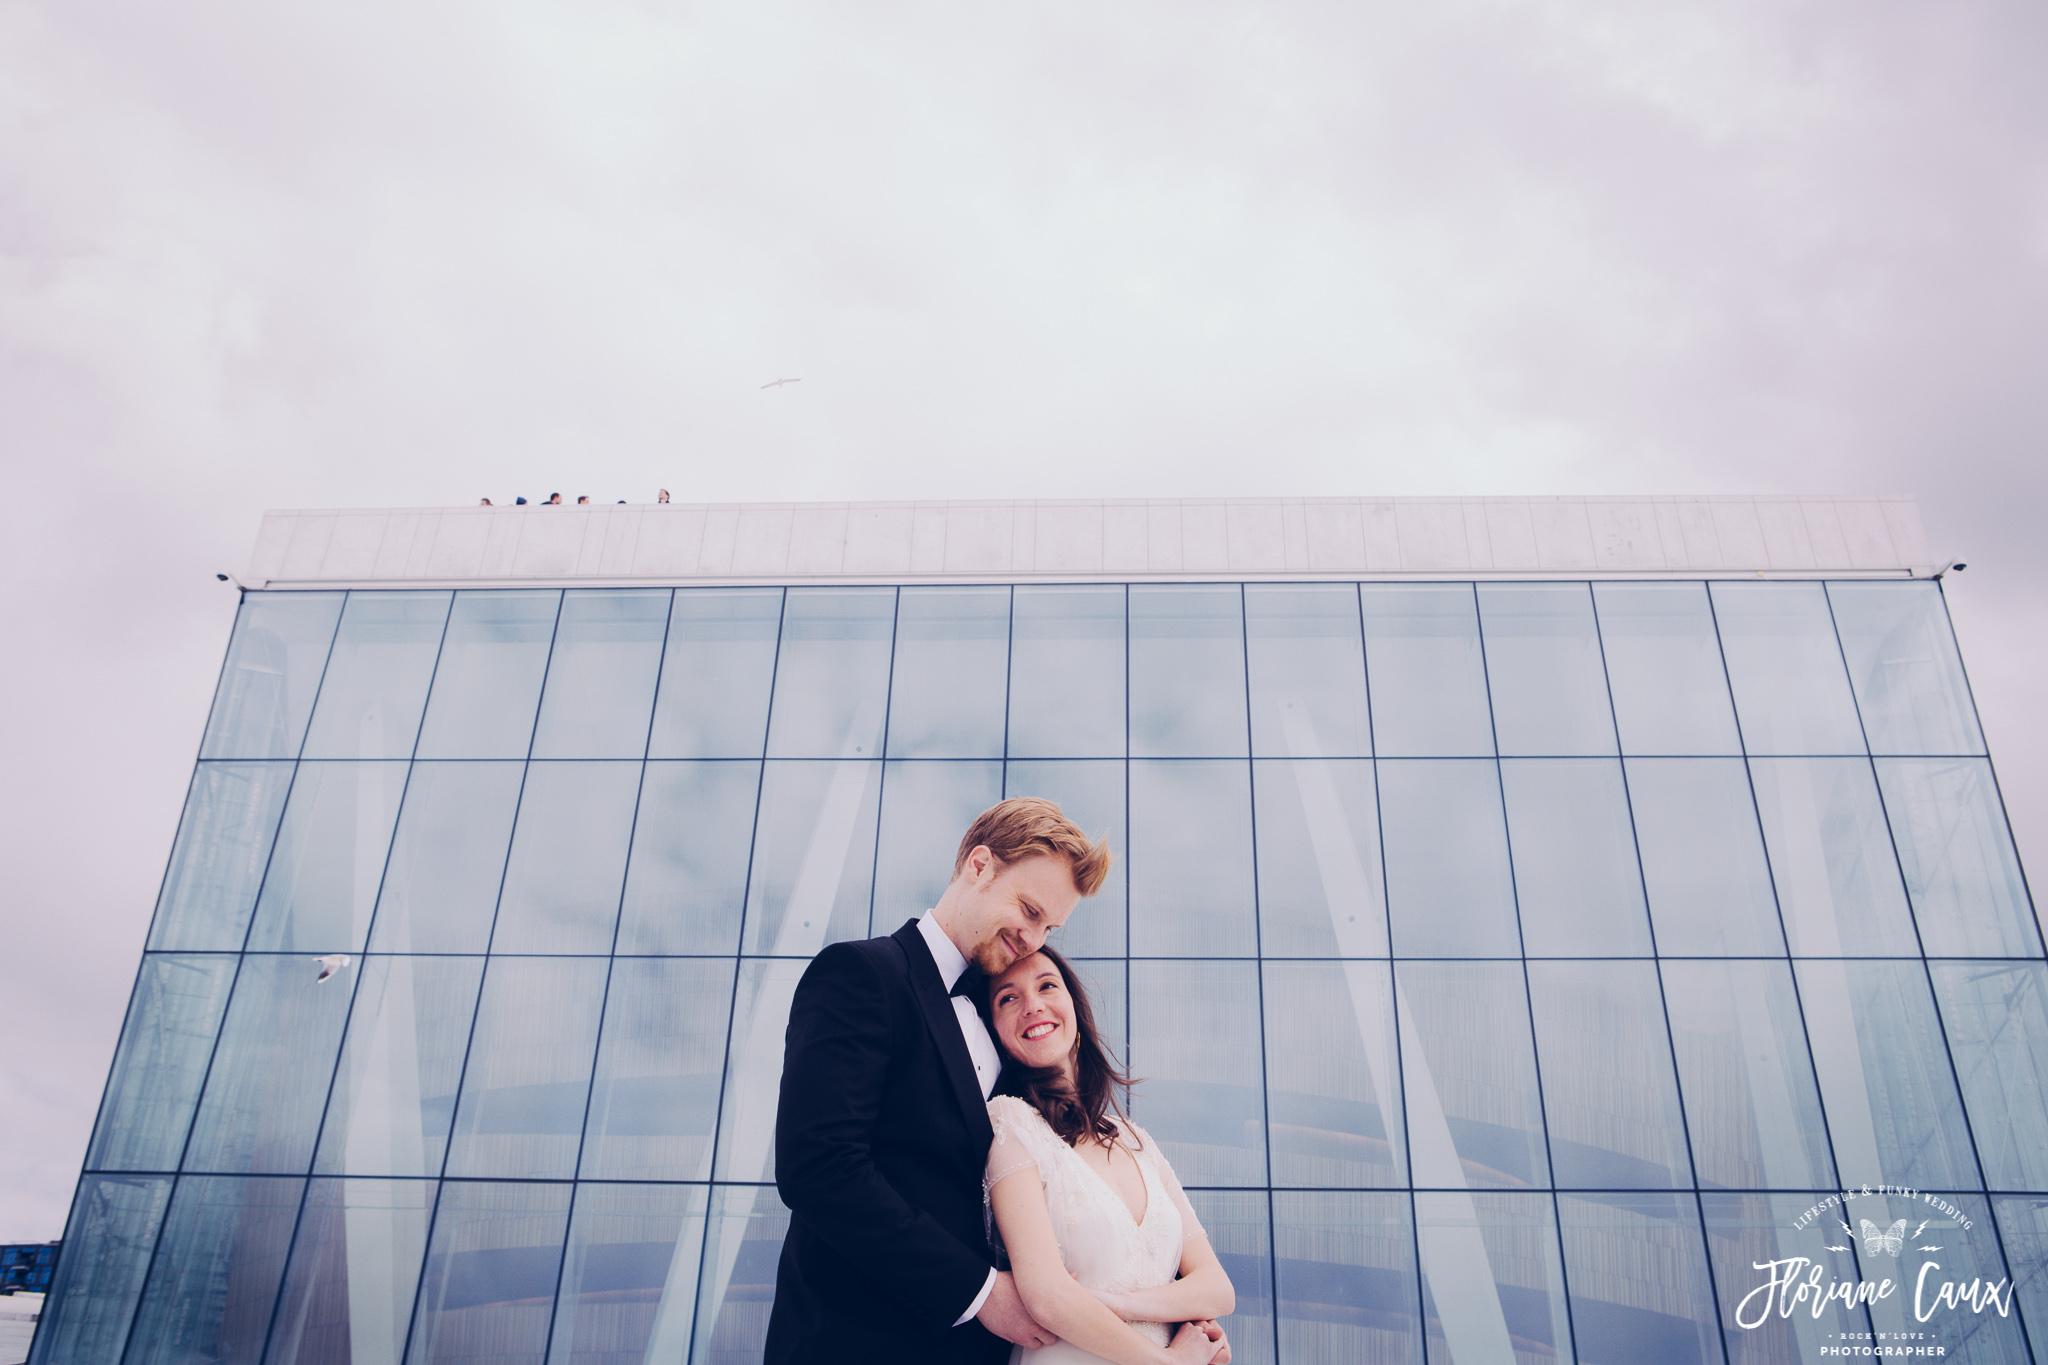 destination-wedding-photographer-oslo-norway-floriane-caux-63